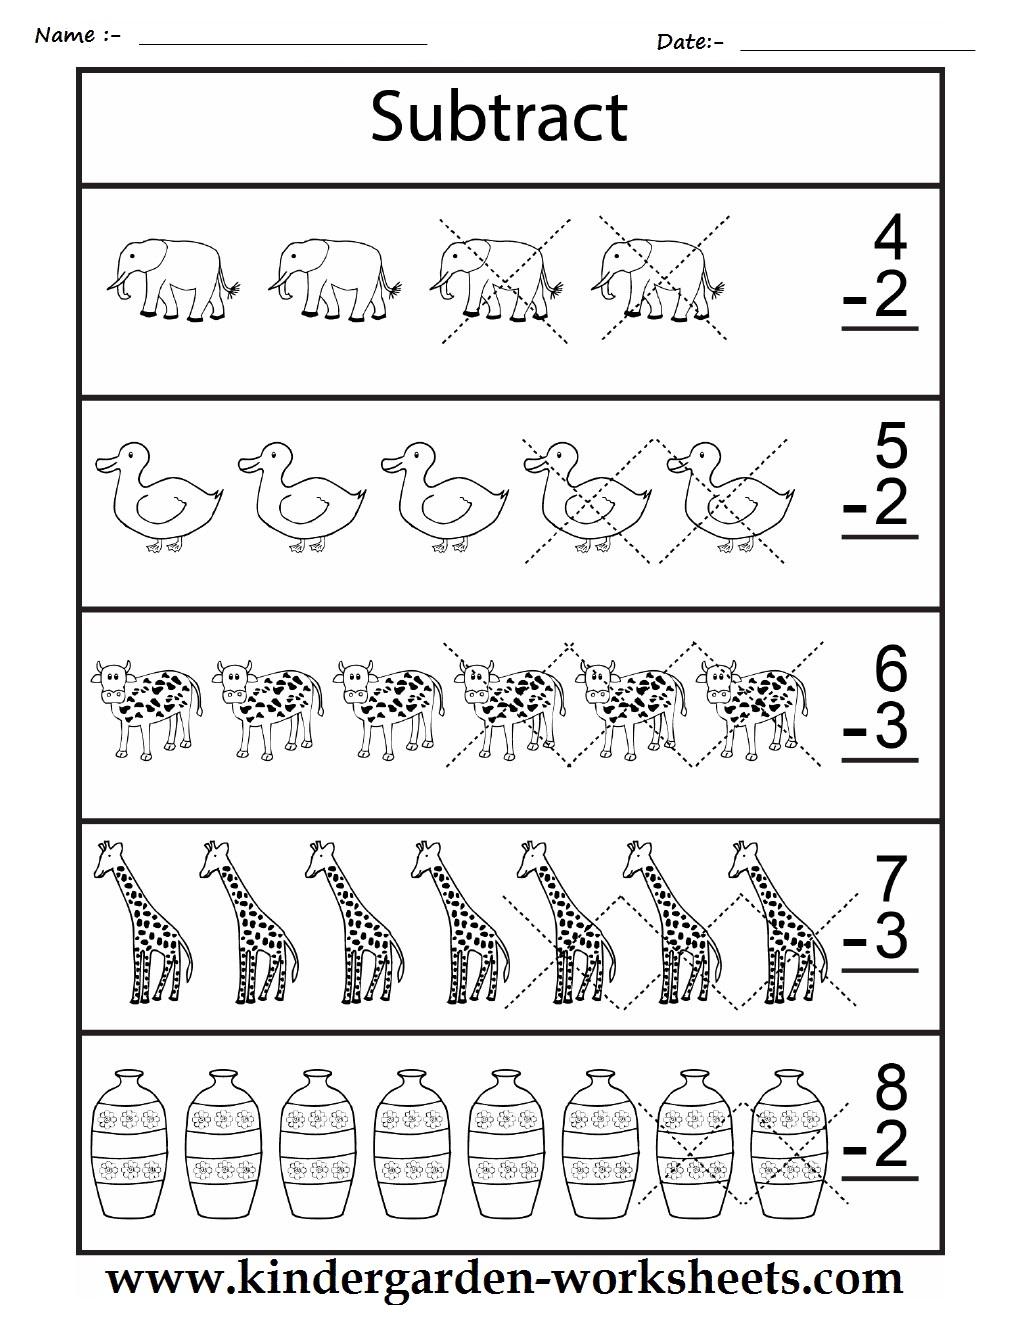 Kindergarten worksheets may 2015 key words tracing worksheets kindergarden worksheets letter tracing worksheets addition worksheets subtraction worksheets multiplication worksheets robcynllc Choice Image